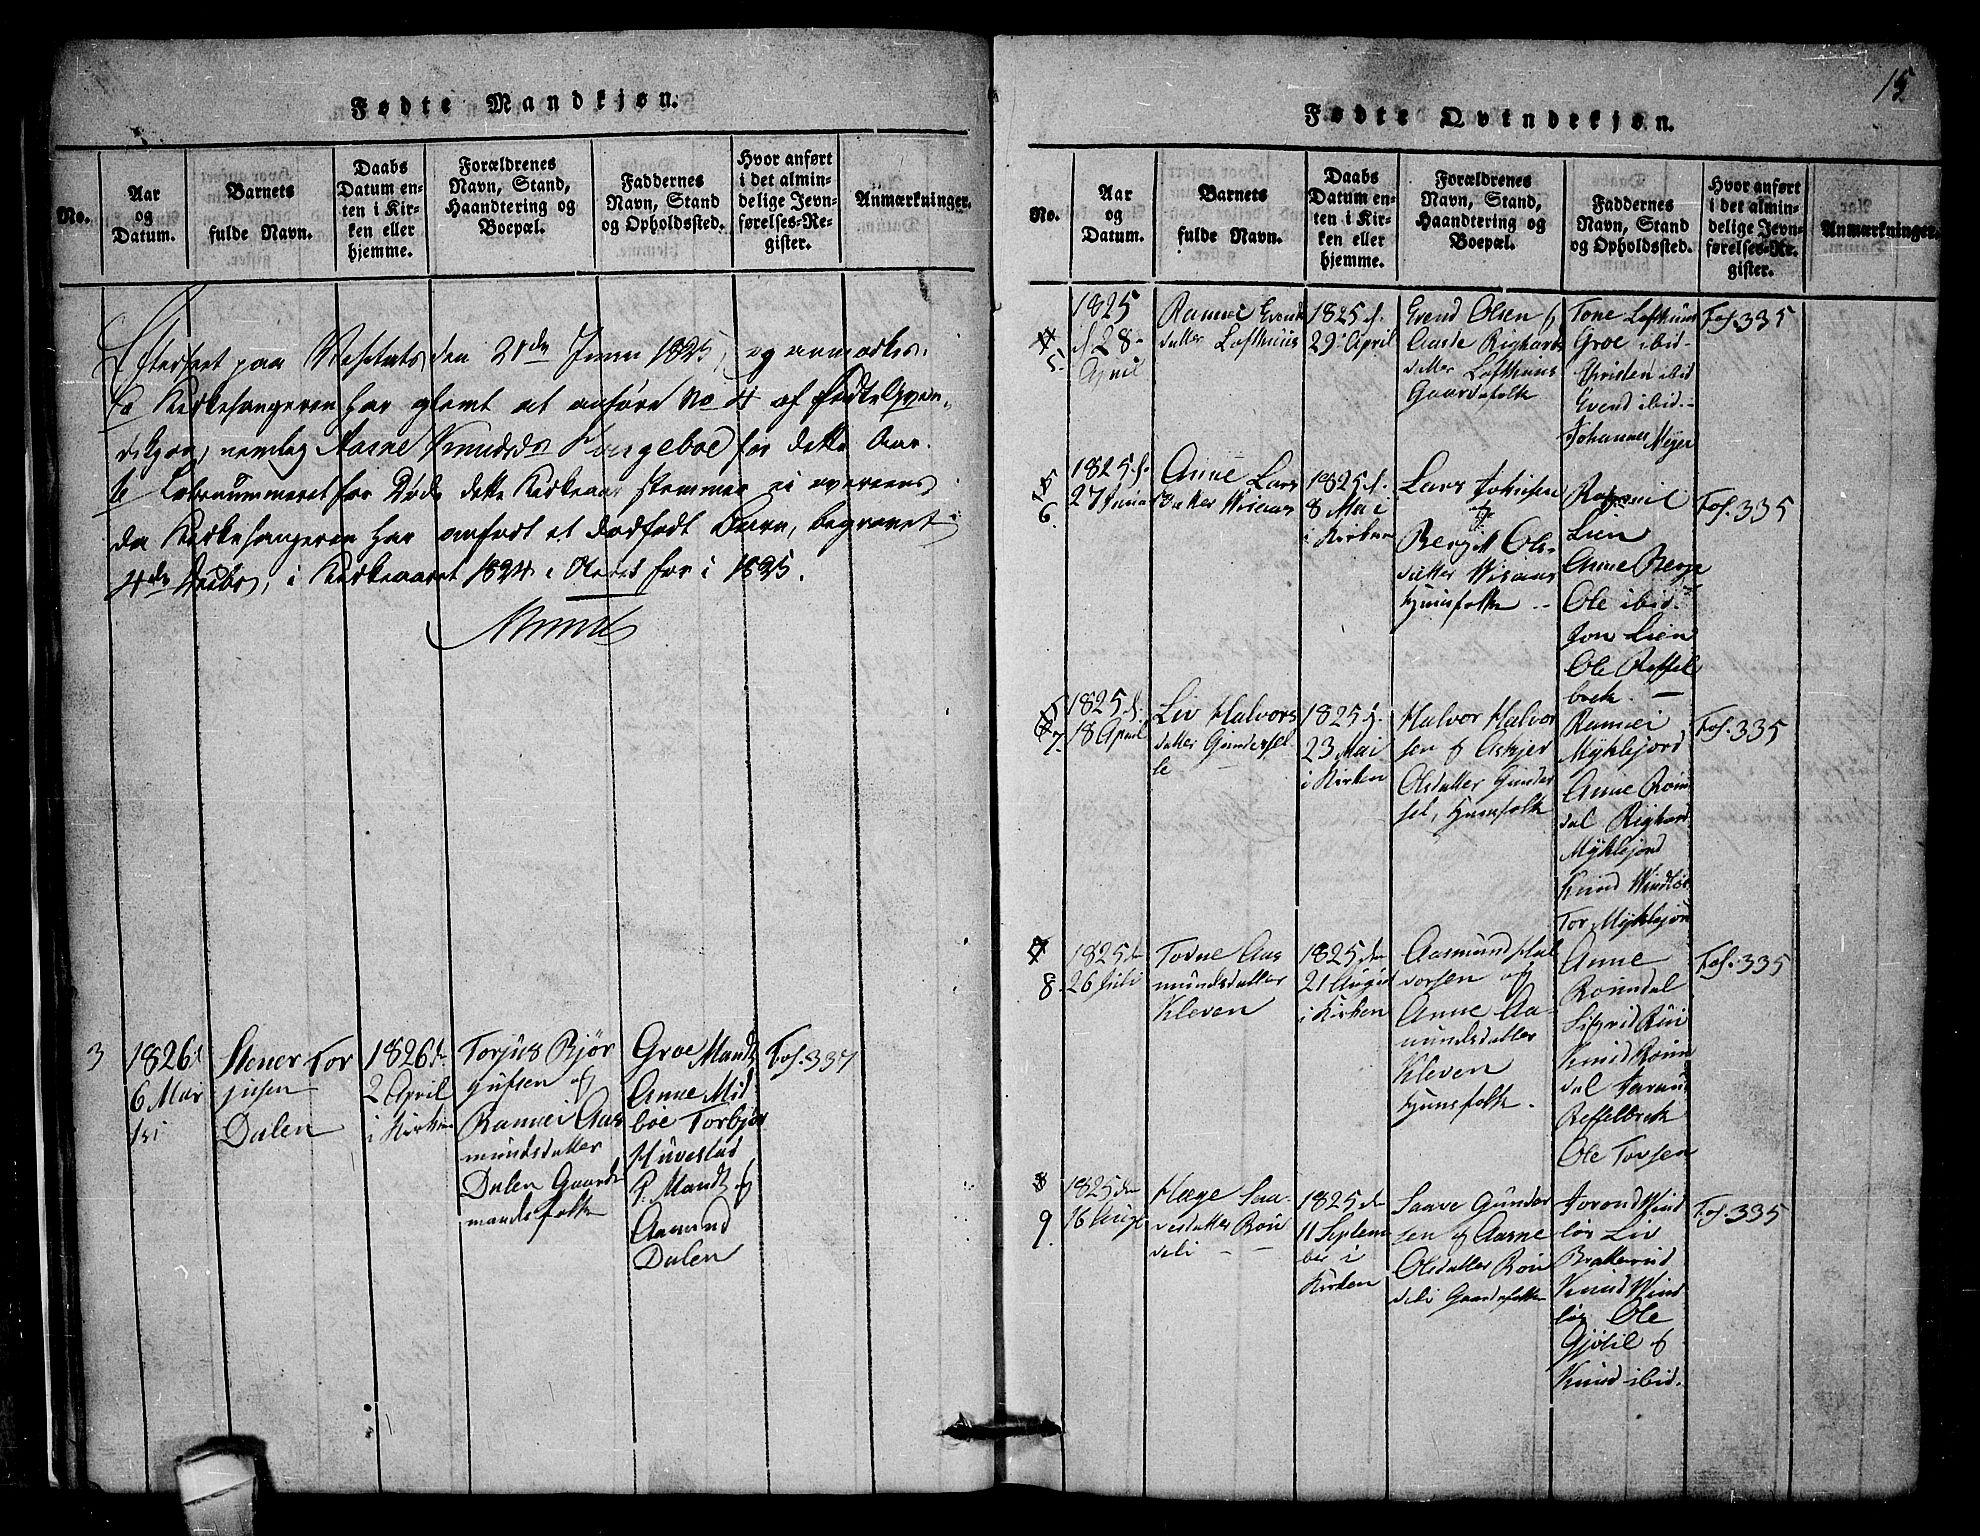 SAKO, Lårdal kirkebøker, G/Gb/L0001: Klokkerbok nr. II 1, 1815-1865, s. 15